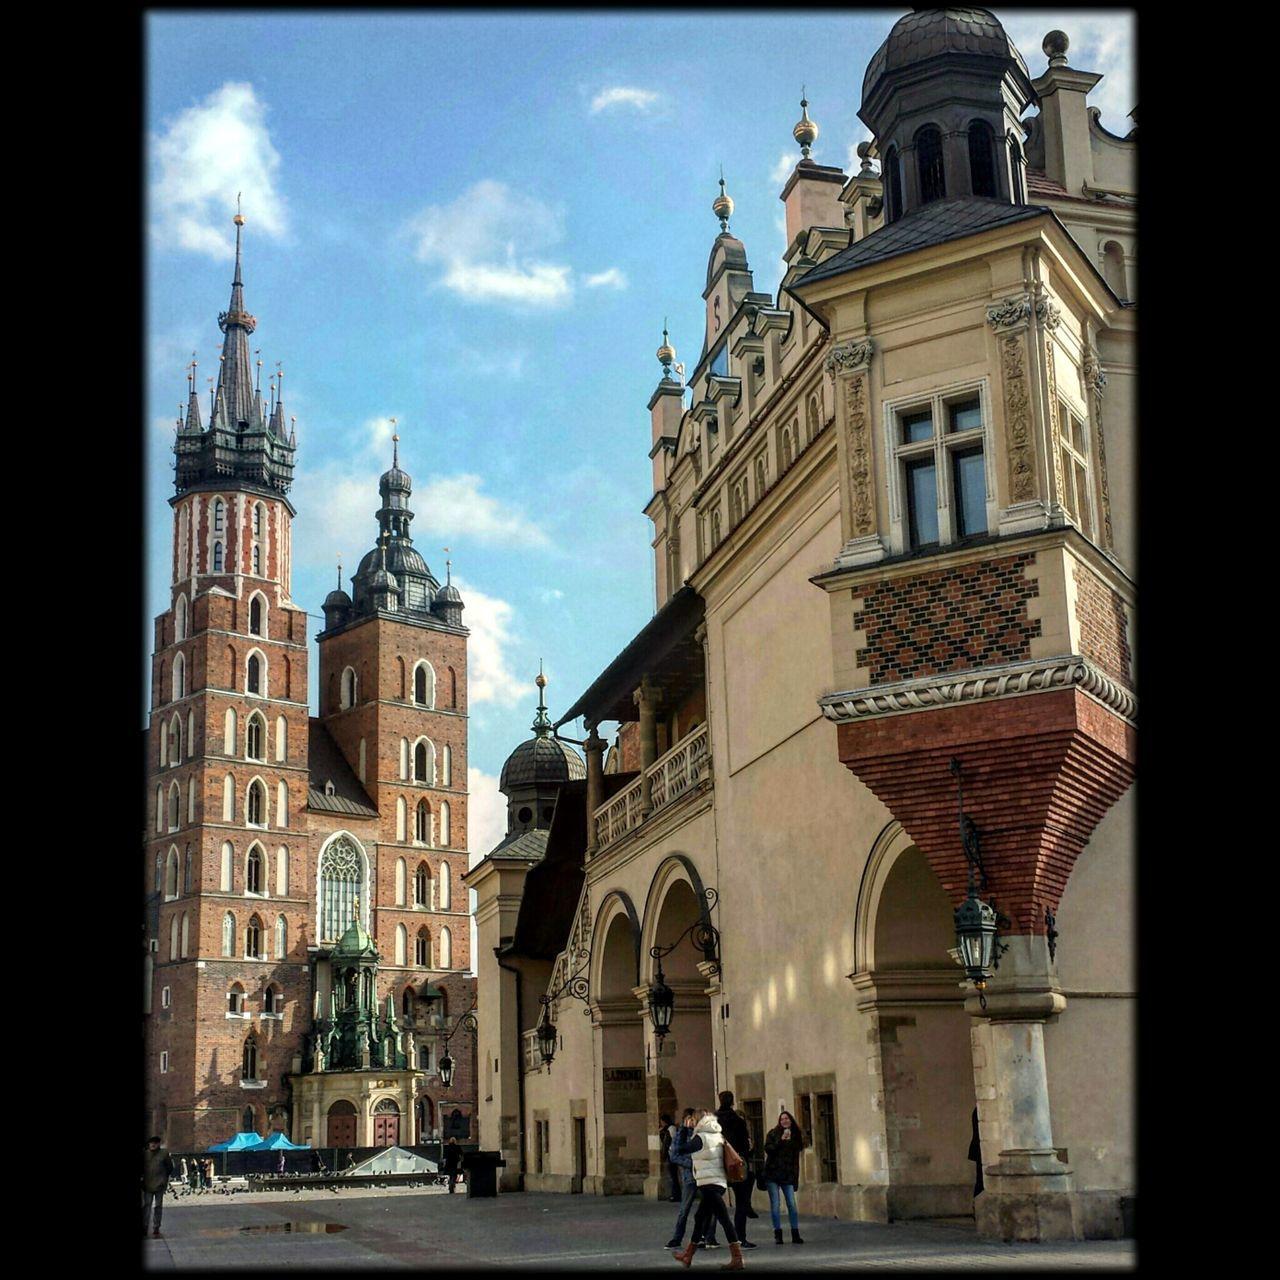 Lovin' Kraków... Architecture Travel Destinations Built Structure City Sky Cityscape Kraków, Poland Clock Tower Town Square Architecture Poland Krakow Cityscape Main Square Tower Travel City History Building Exterior